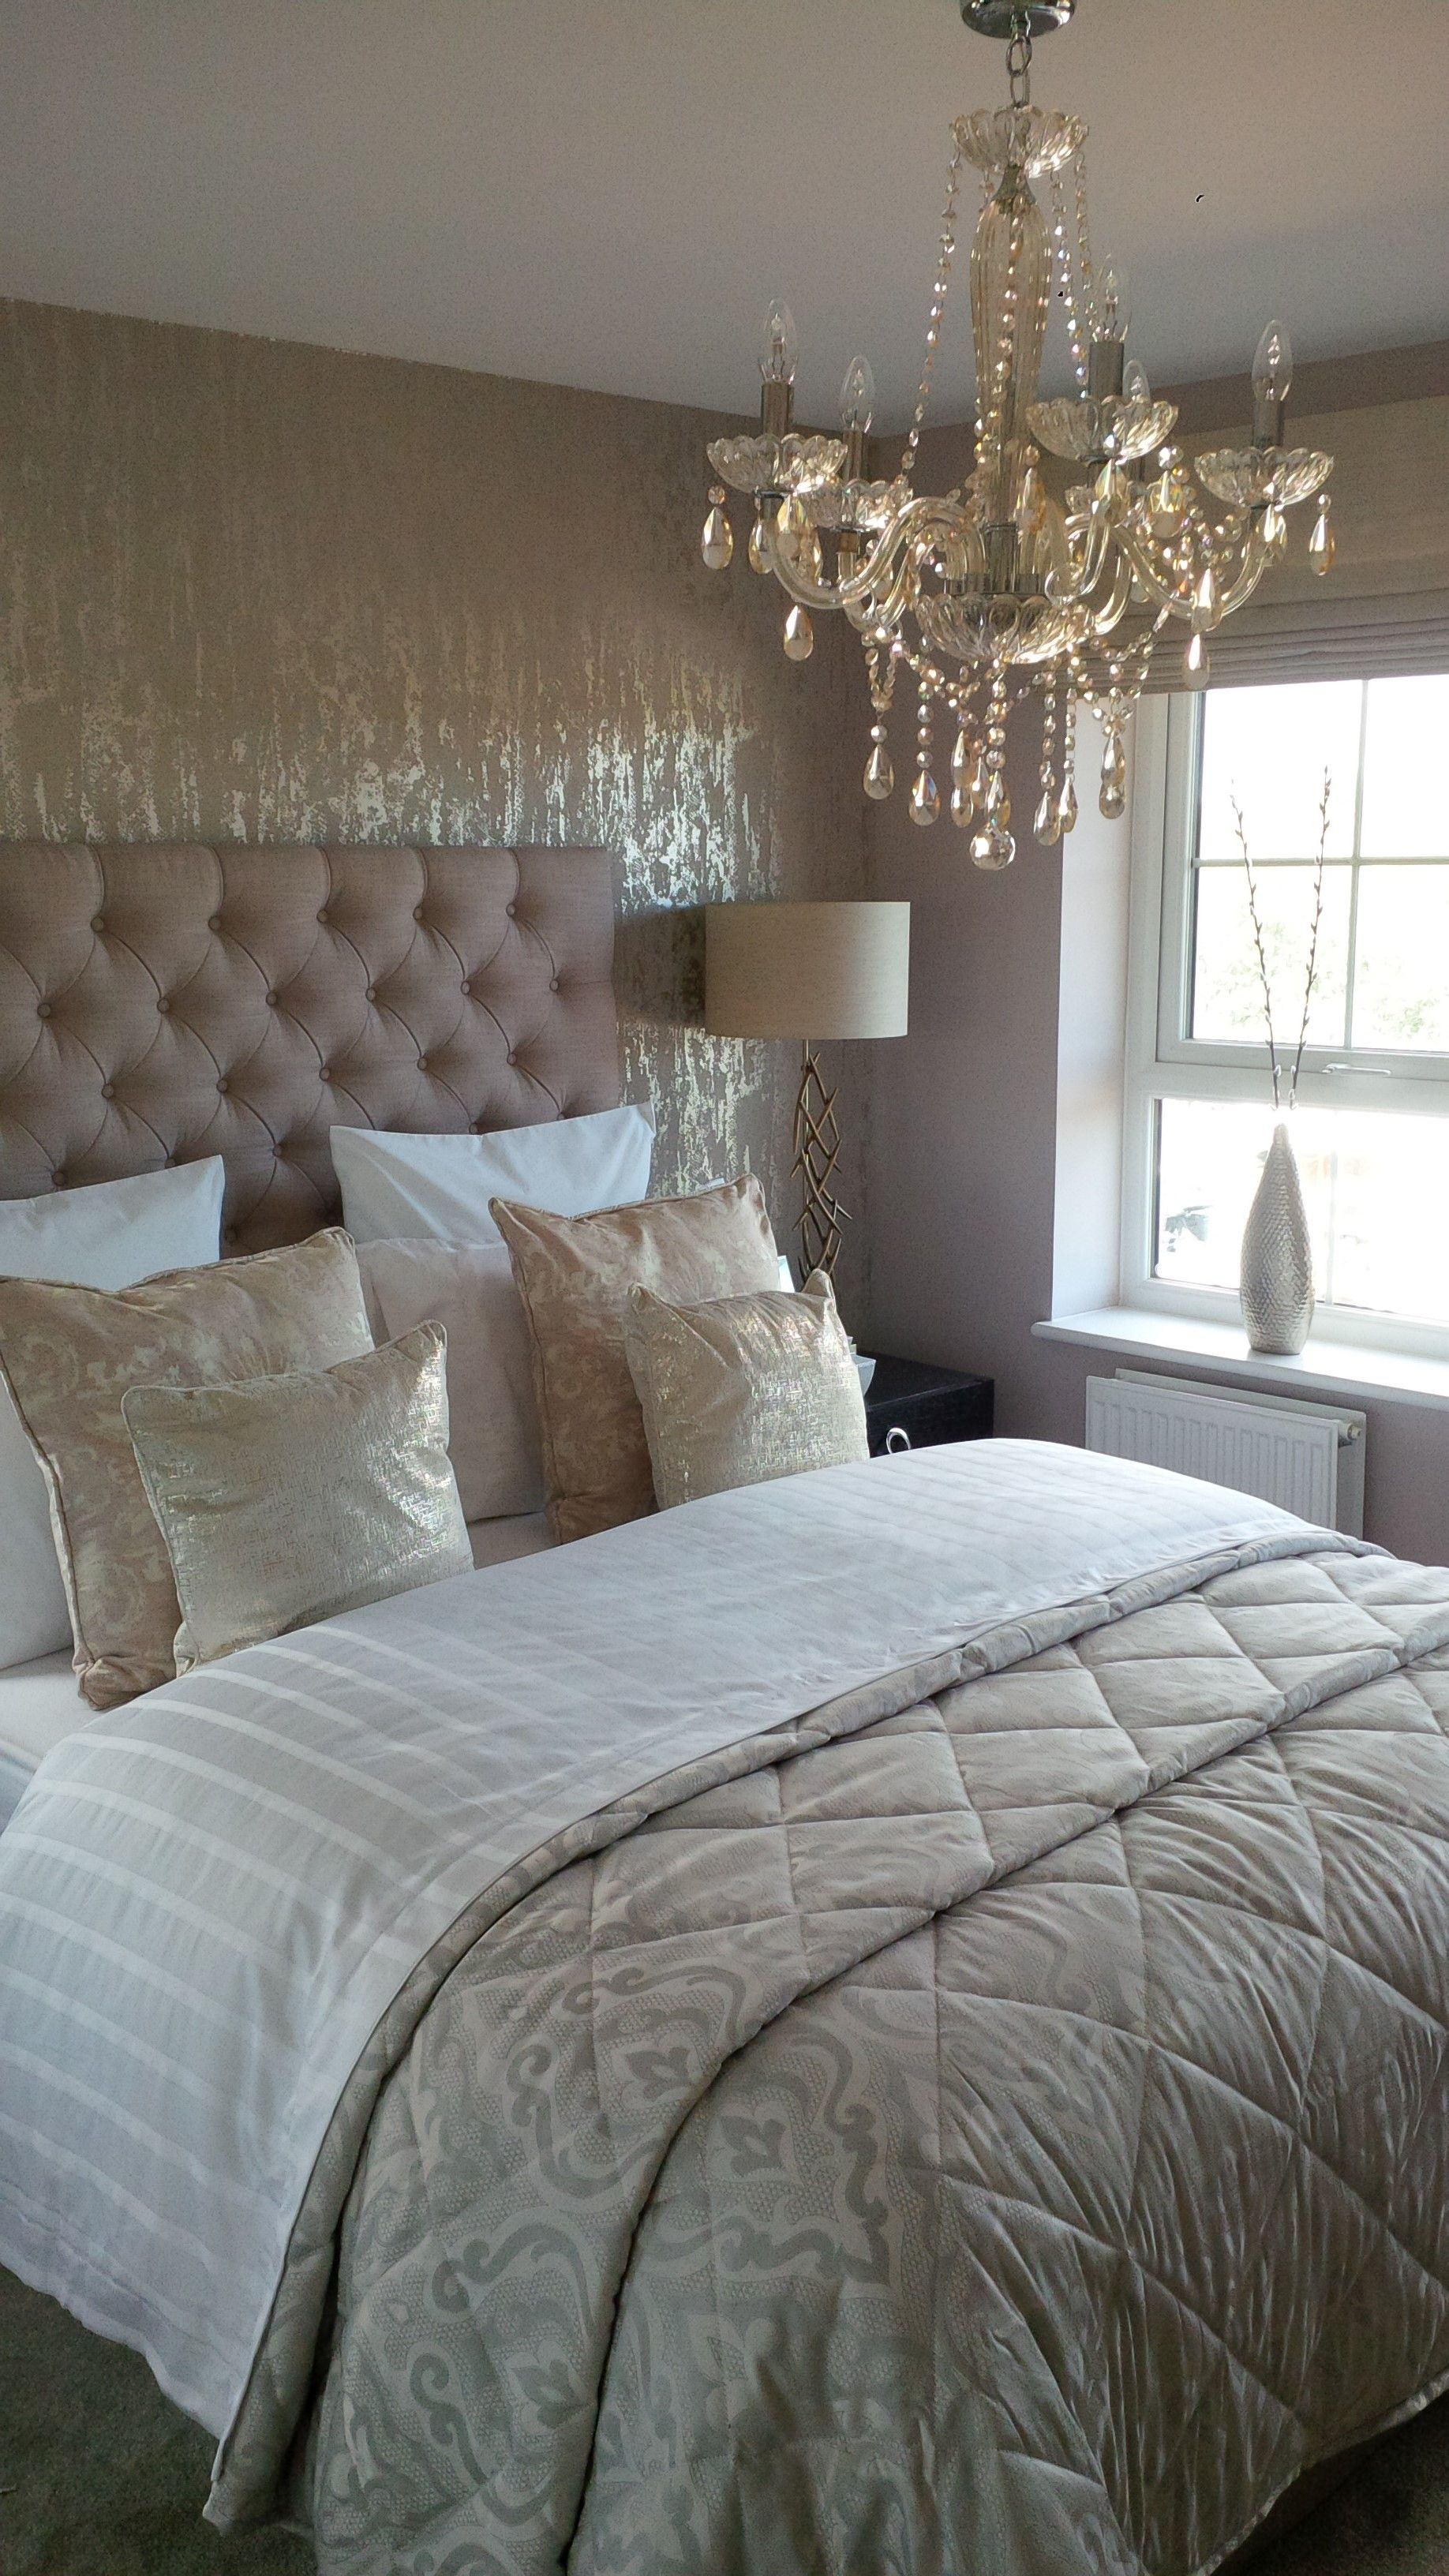 Beautiful Colors In This Bedroom It S So Cozy And Warm Z Luxurious Bedrooms Silver Wallpaper Bedroom Best Bedroom Colors